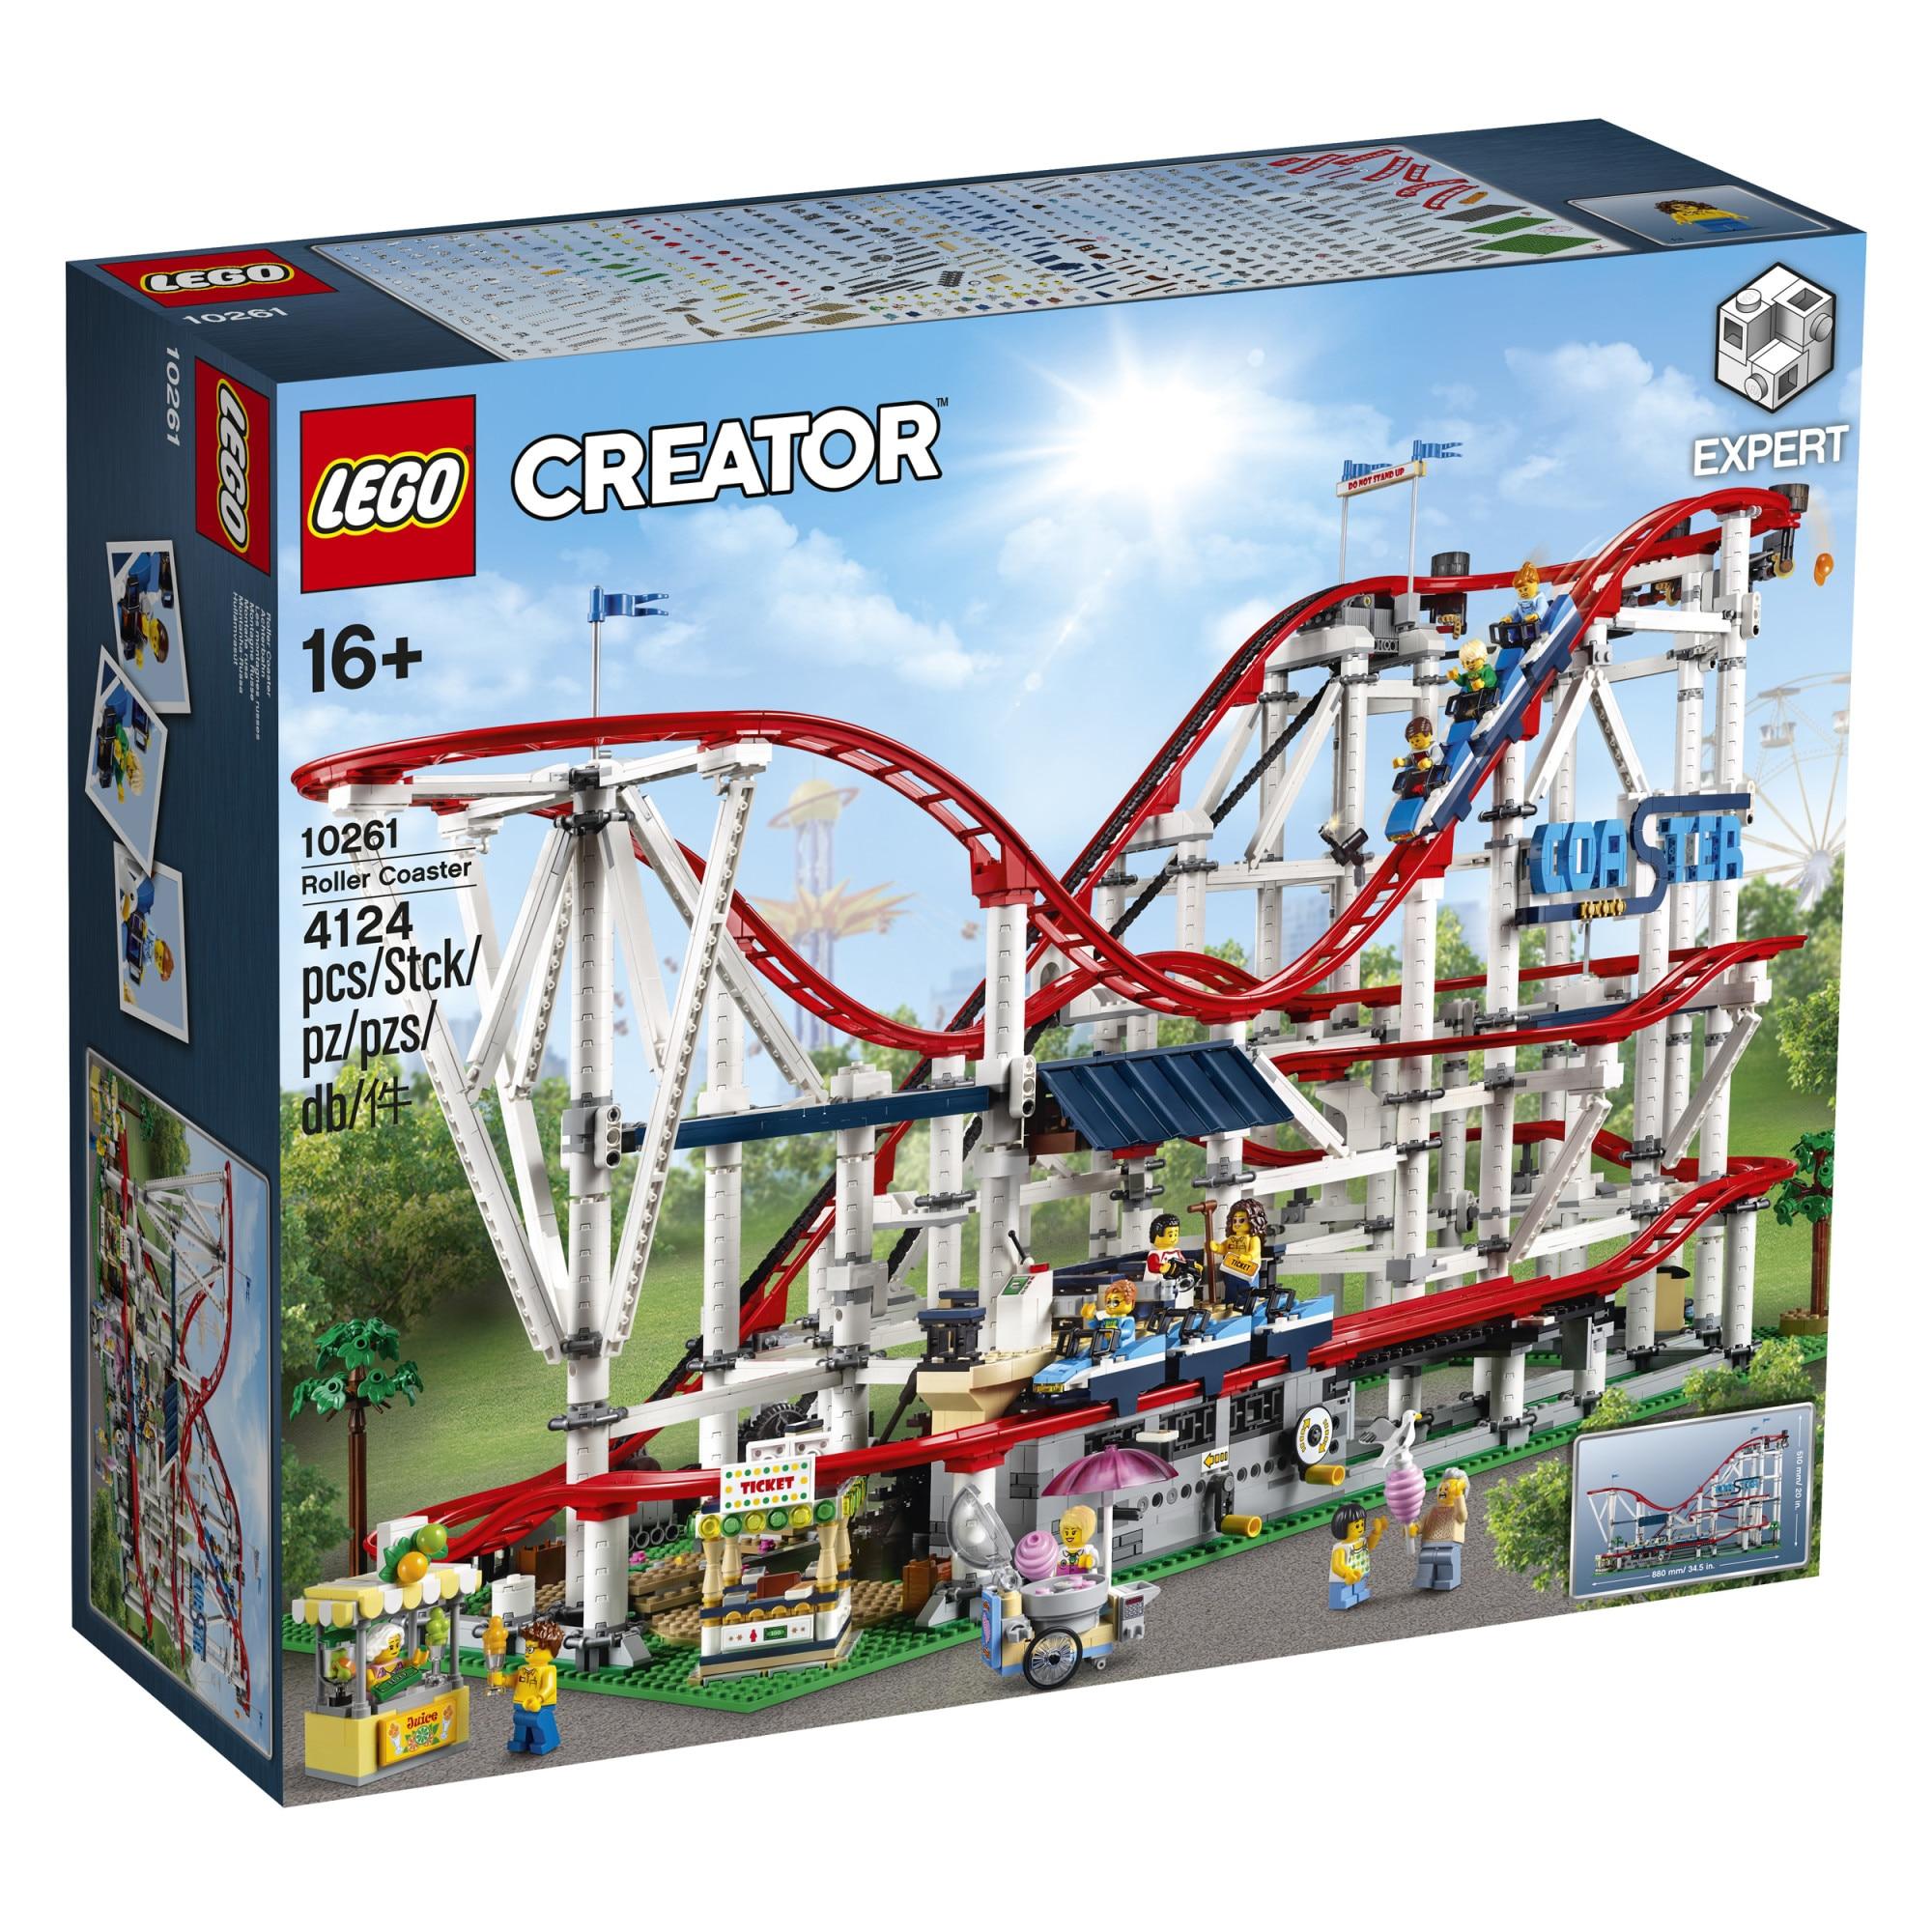 Fotografie LEGO Creator Expert - Roller Coaster 10261, 4124 piese